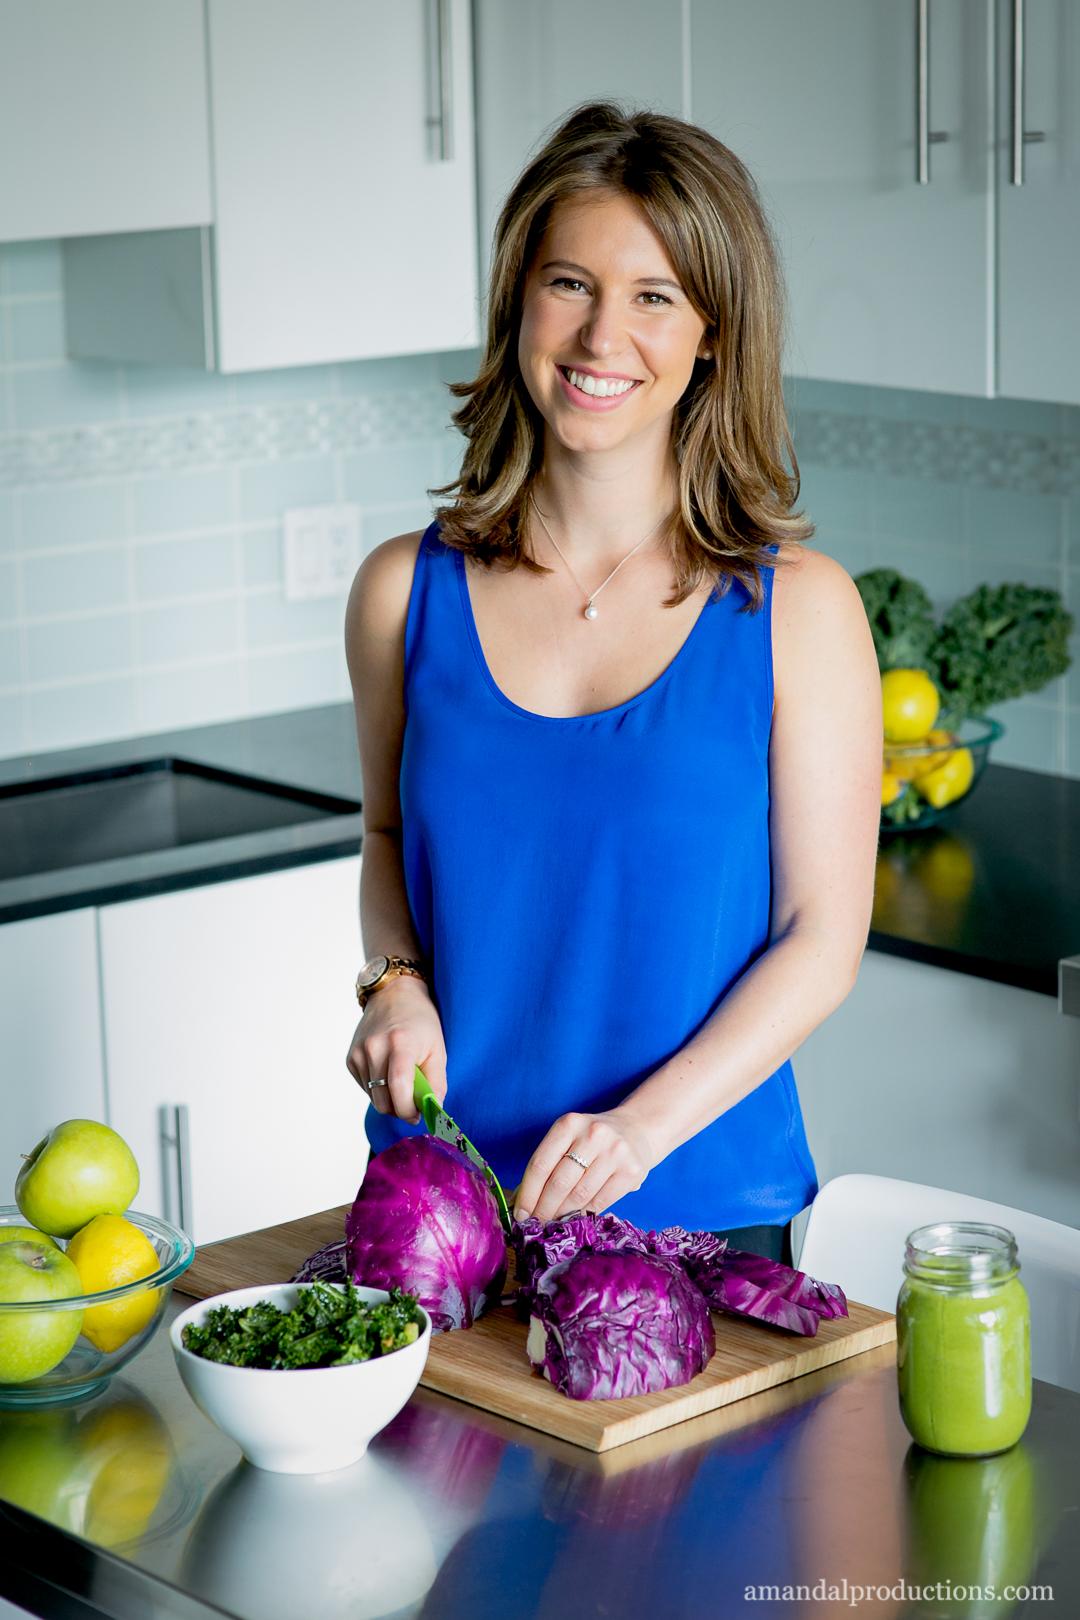 Mandy King - HEAL - Healthy Eating And Living_BIO photo